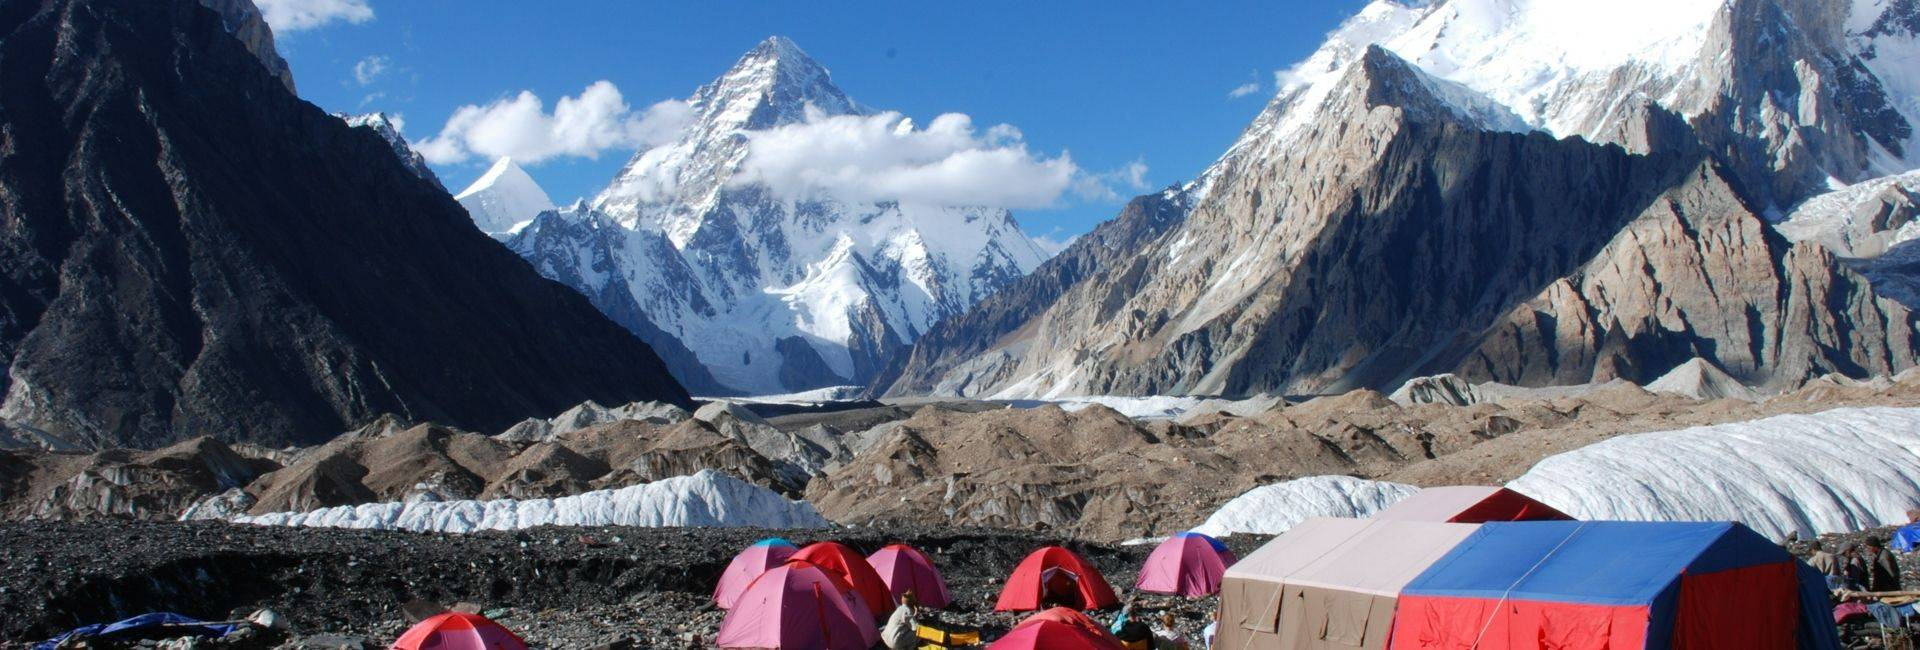 K2 Base Camp & Gondogoro La in Pakistan